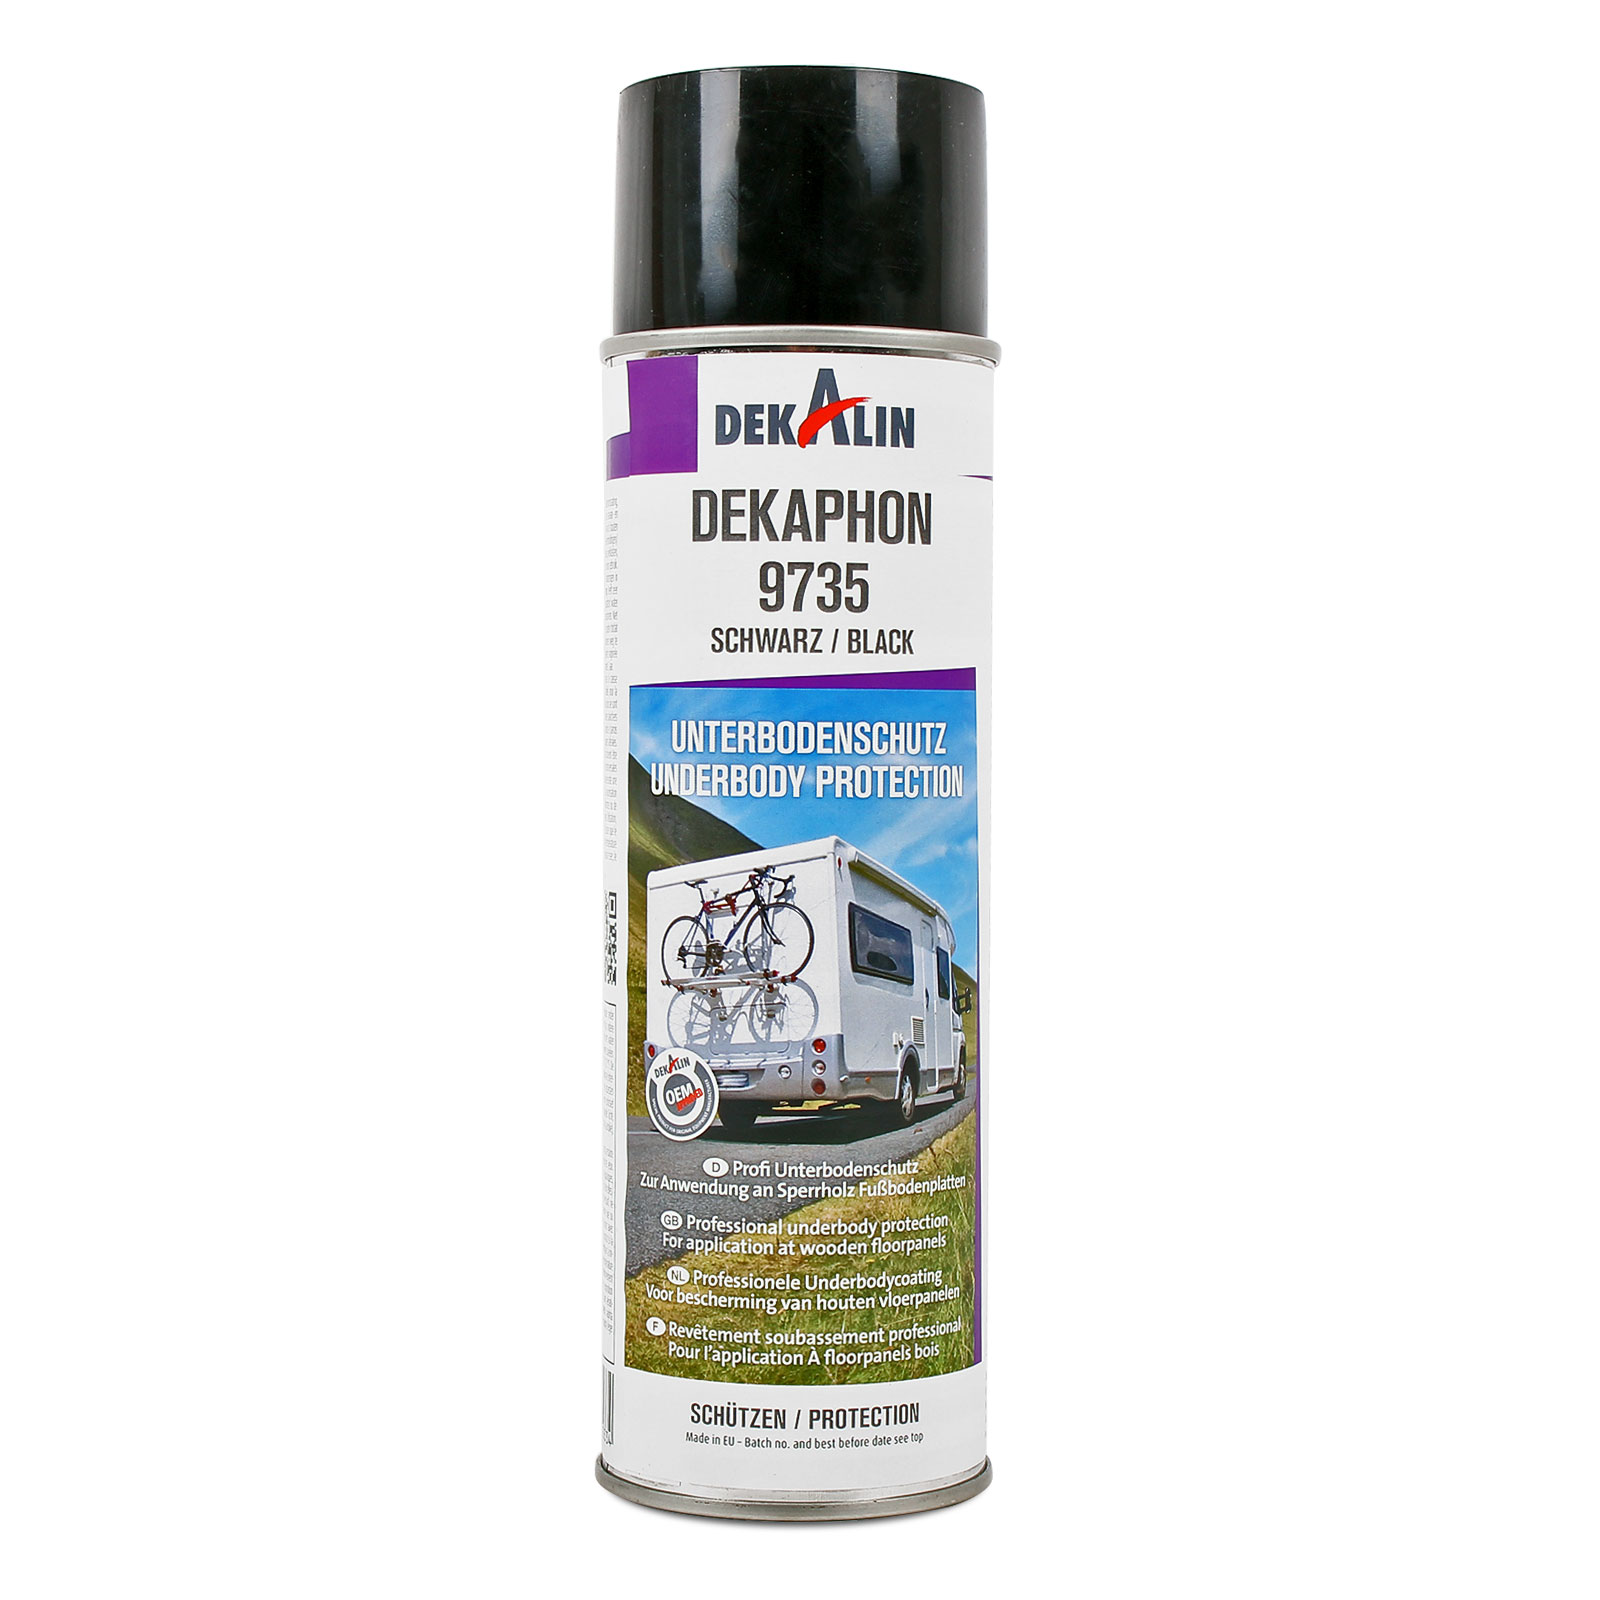 Dekaphon 9735 Unterbodenschutz für Sperrholz & Fußbodenplatten 500 ml